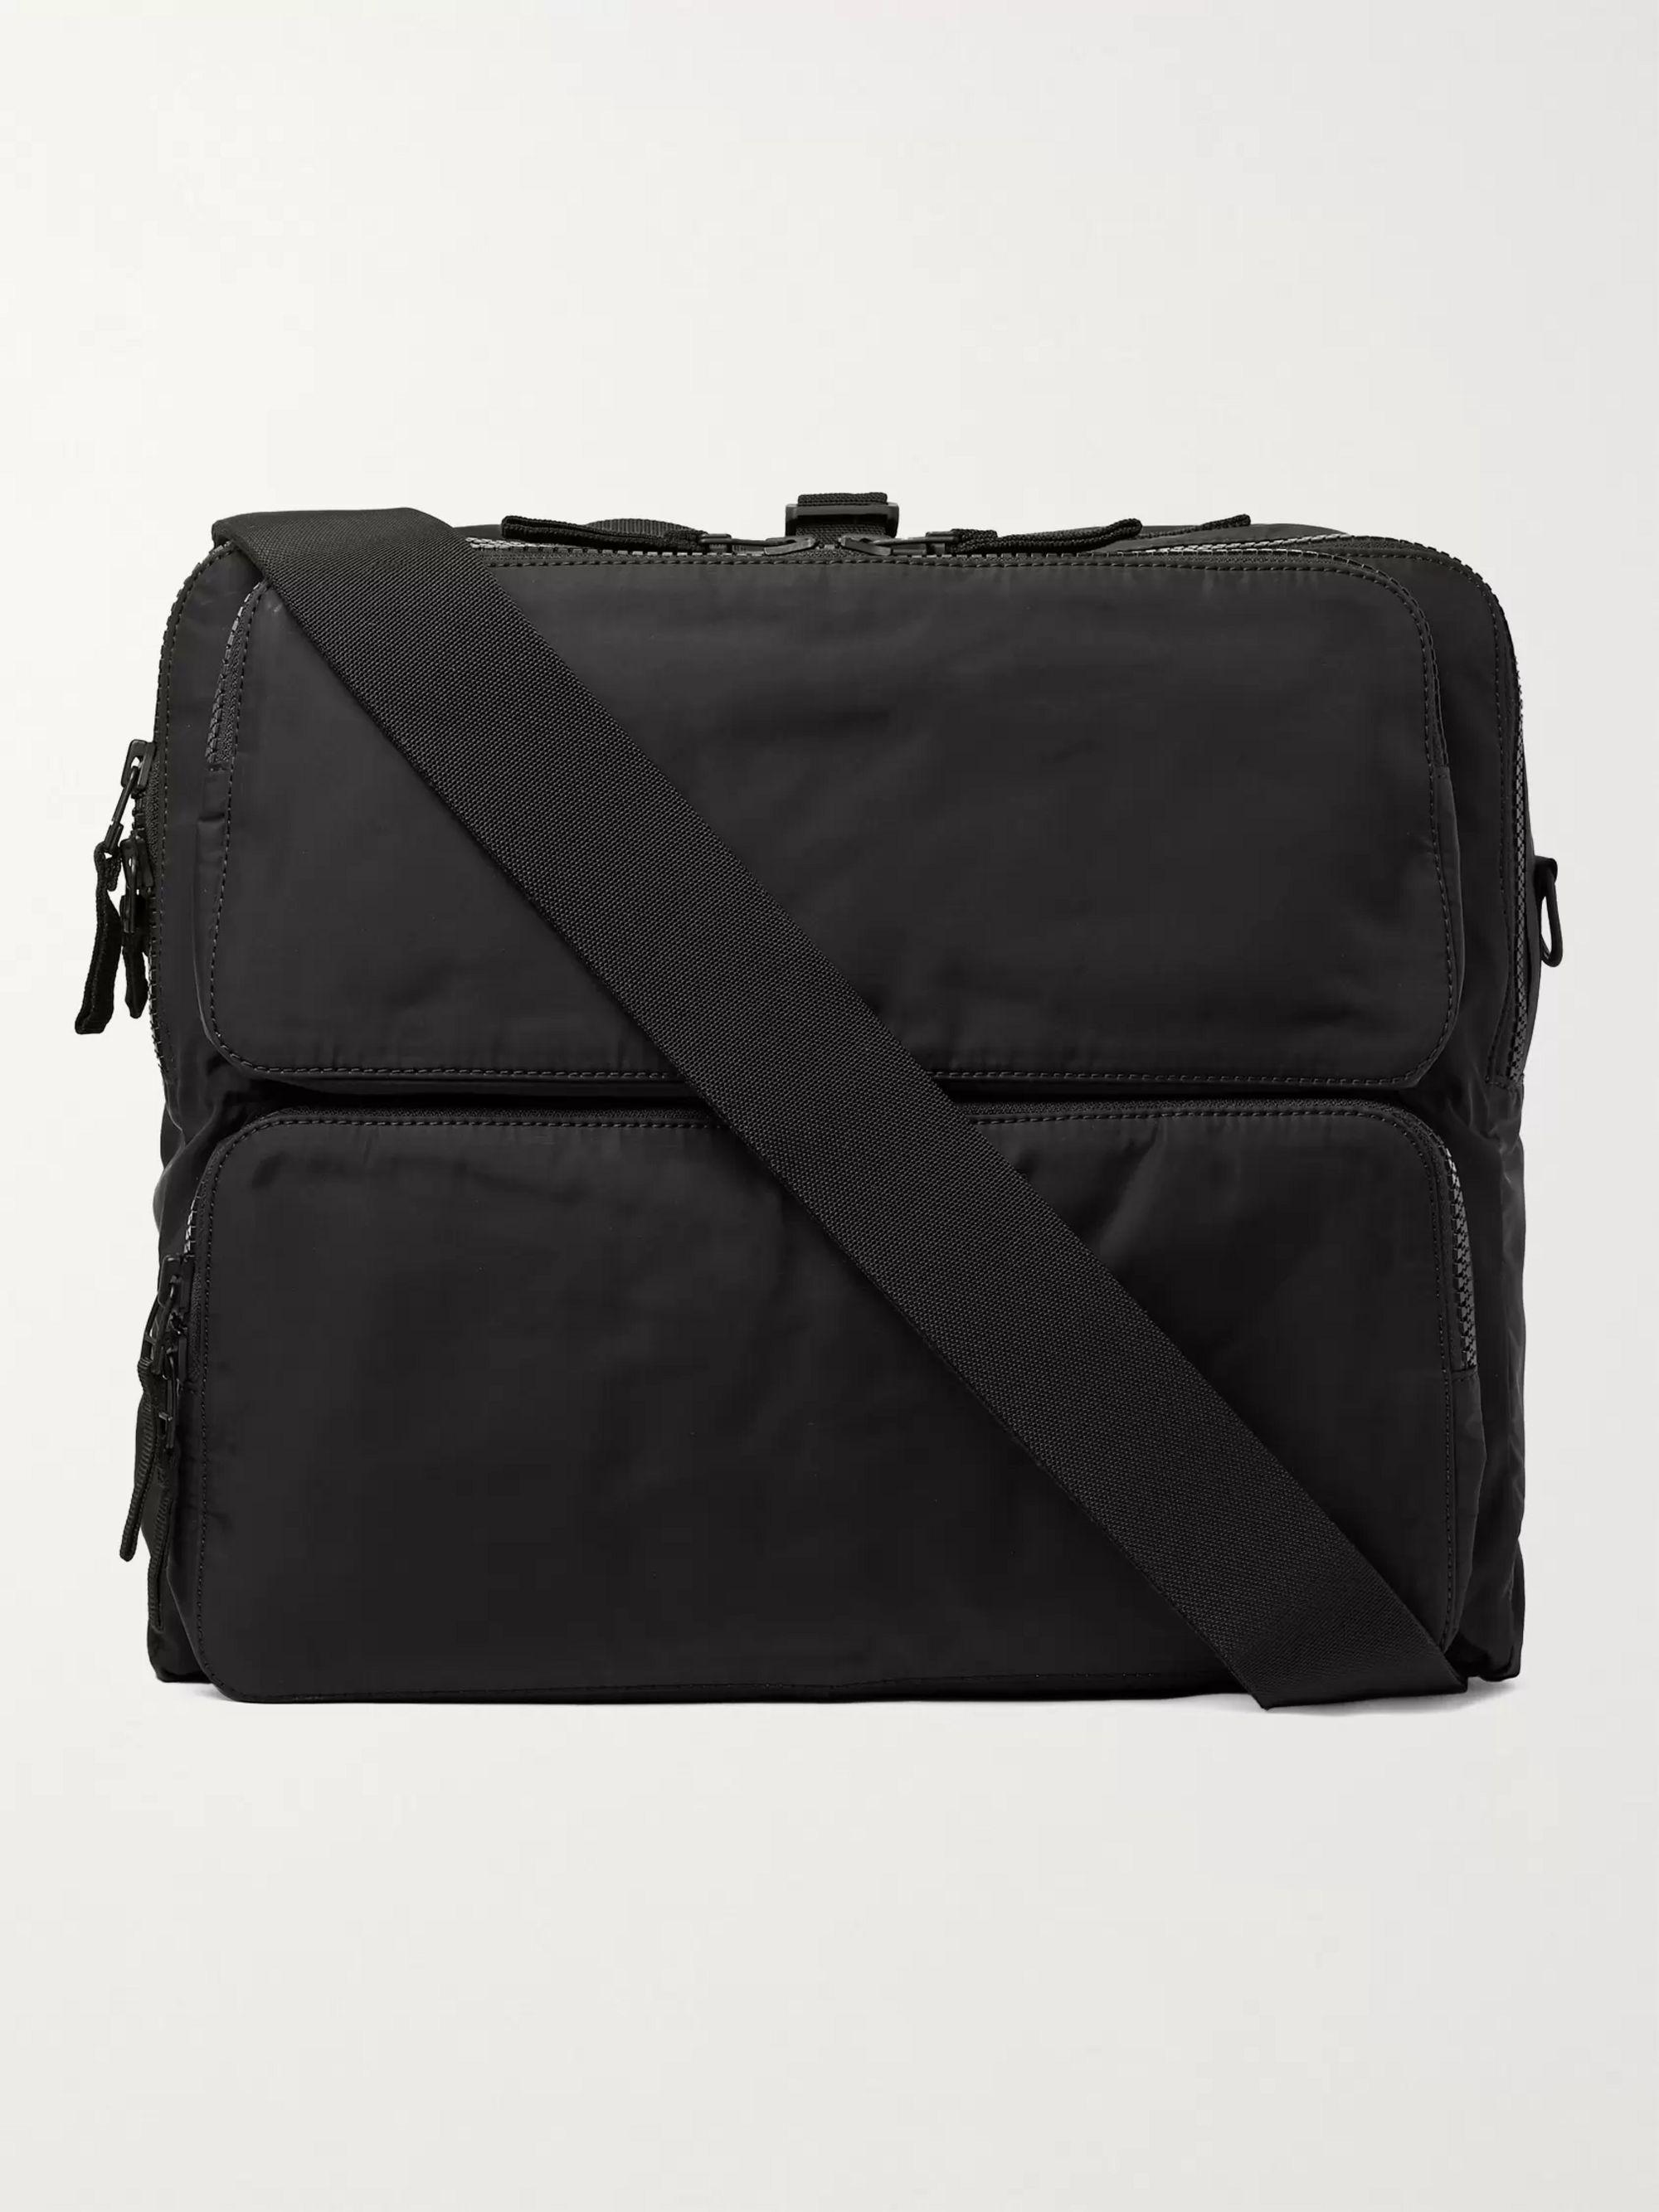 JAMES PERSE Nylon Messenger Bag,Black